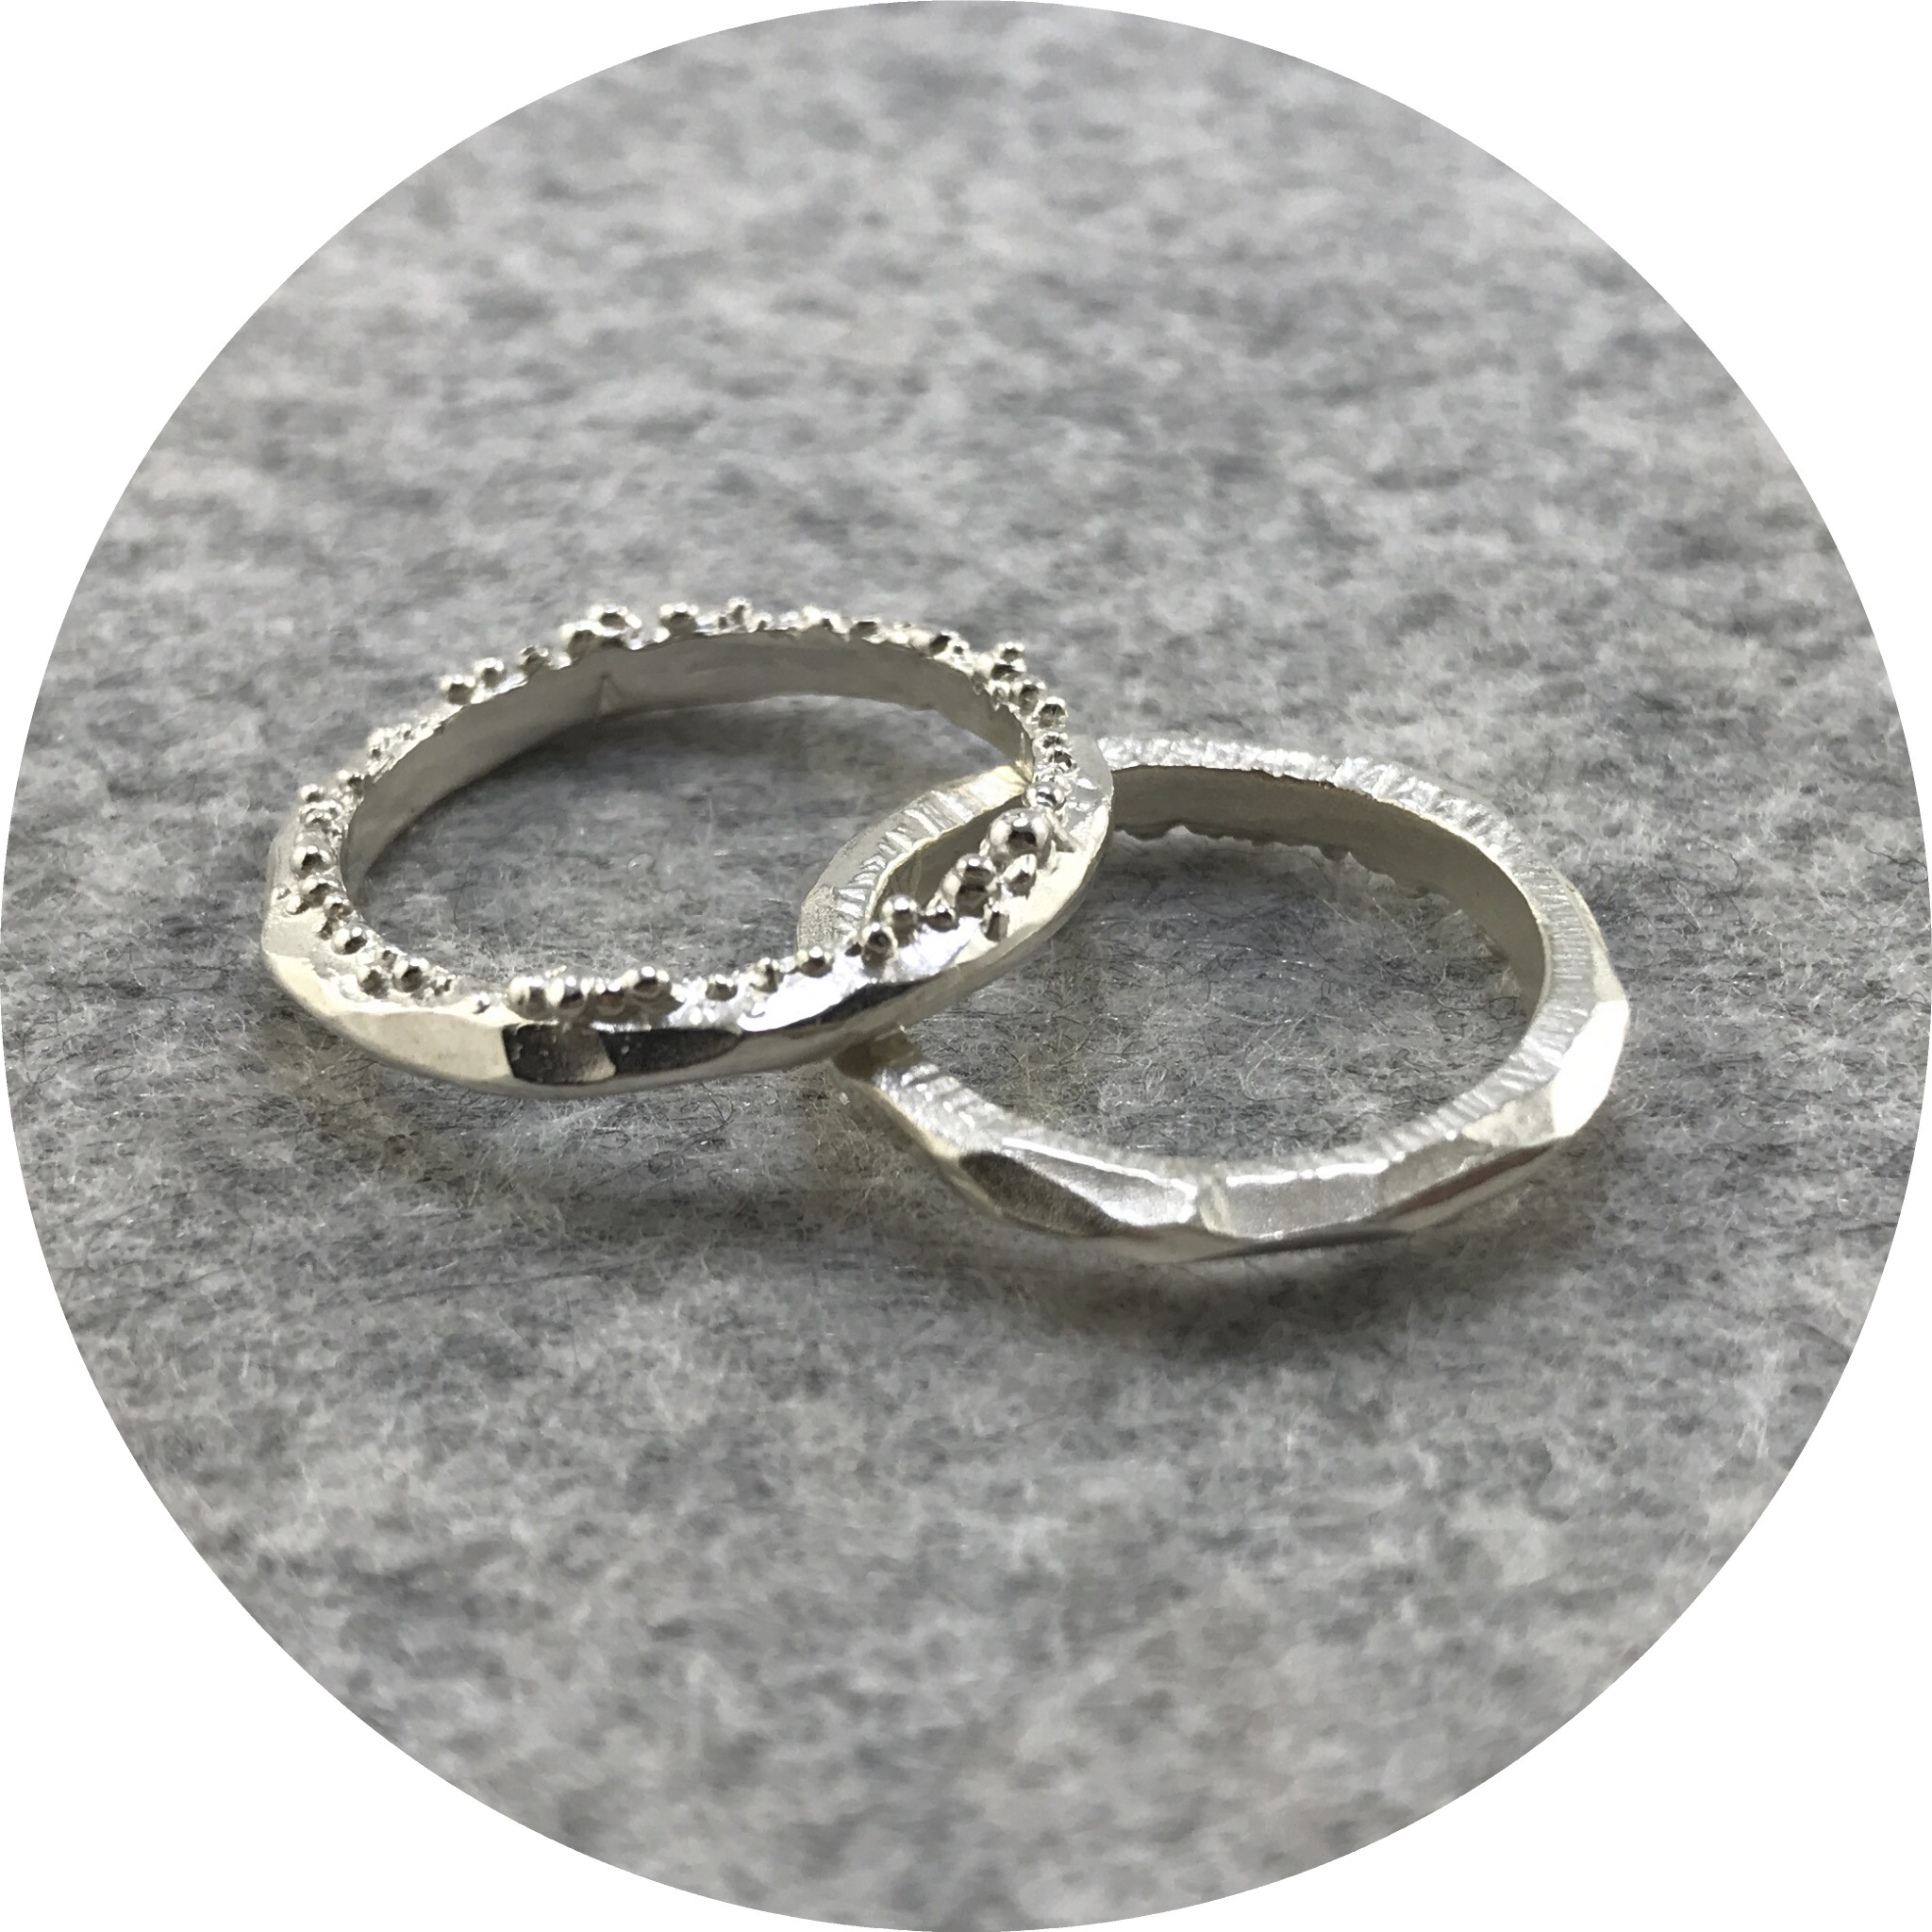 Abby Seymour- Stamen Ring. Sterling silver.